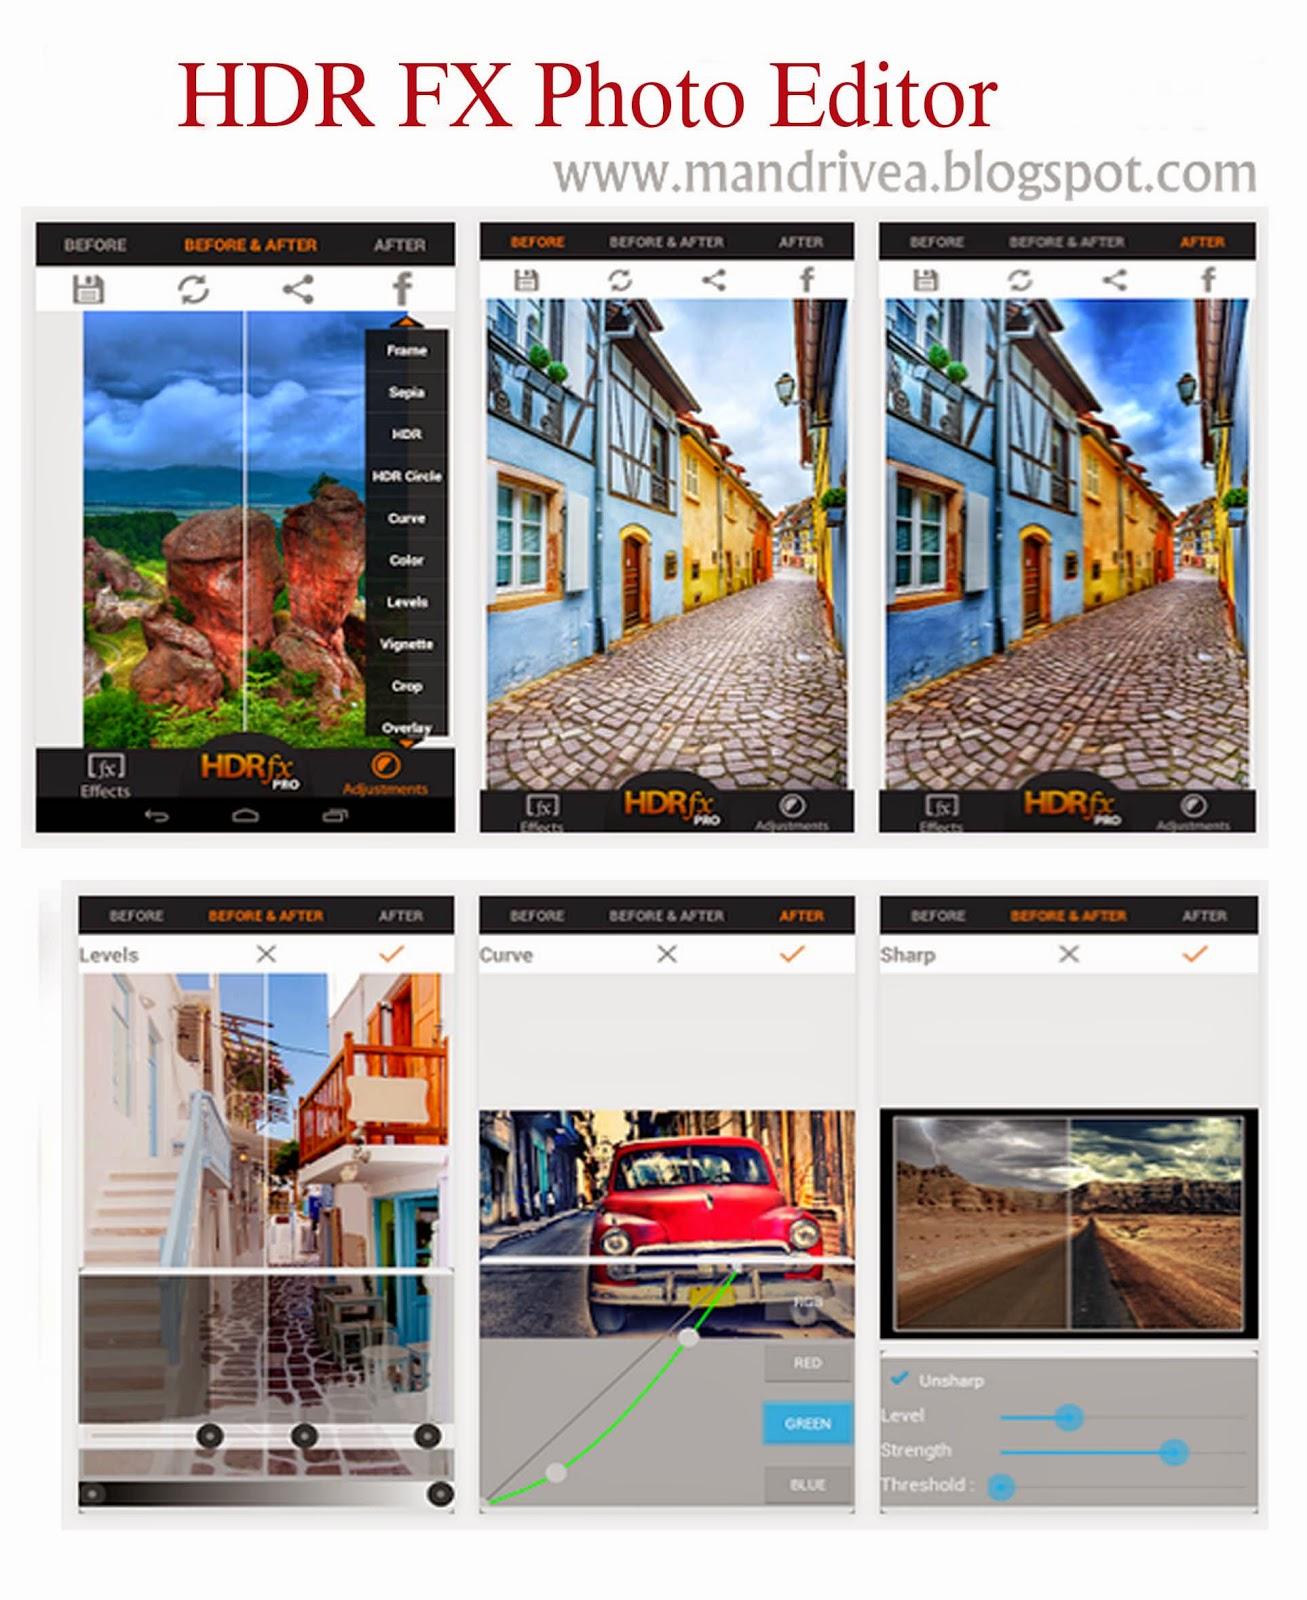 HDR Software Fotor Free Online HDR Software Fotor Photo Editor Free online hdr photo editor